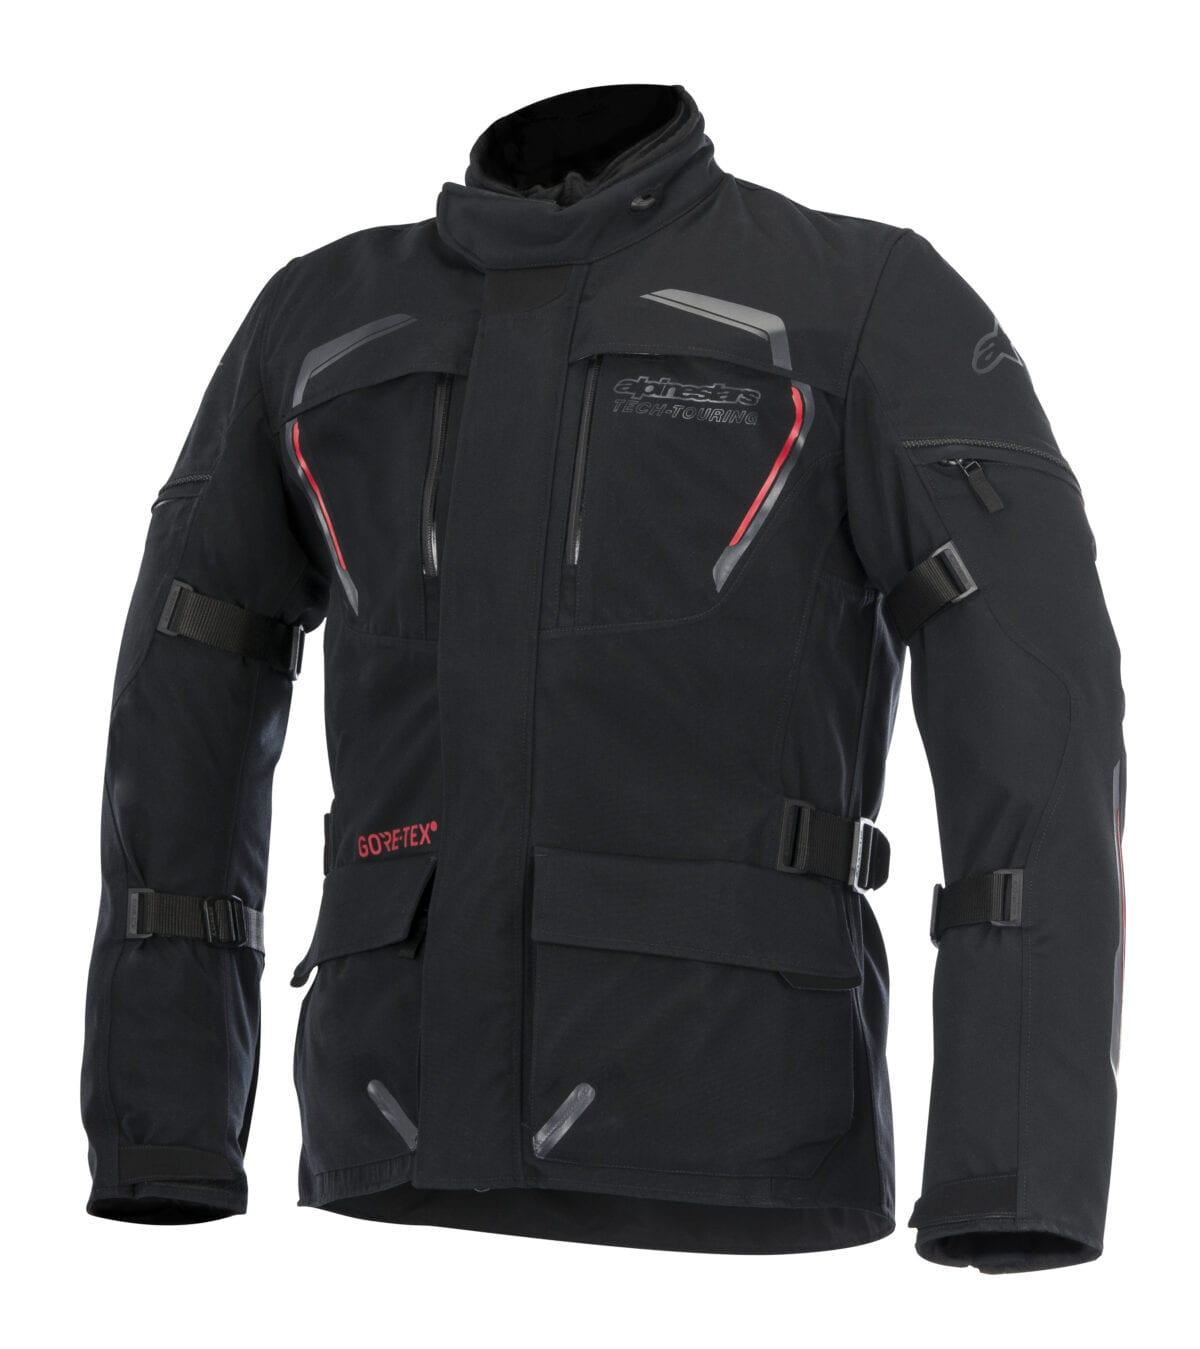 3604017_10_MANAGUA_jacket